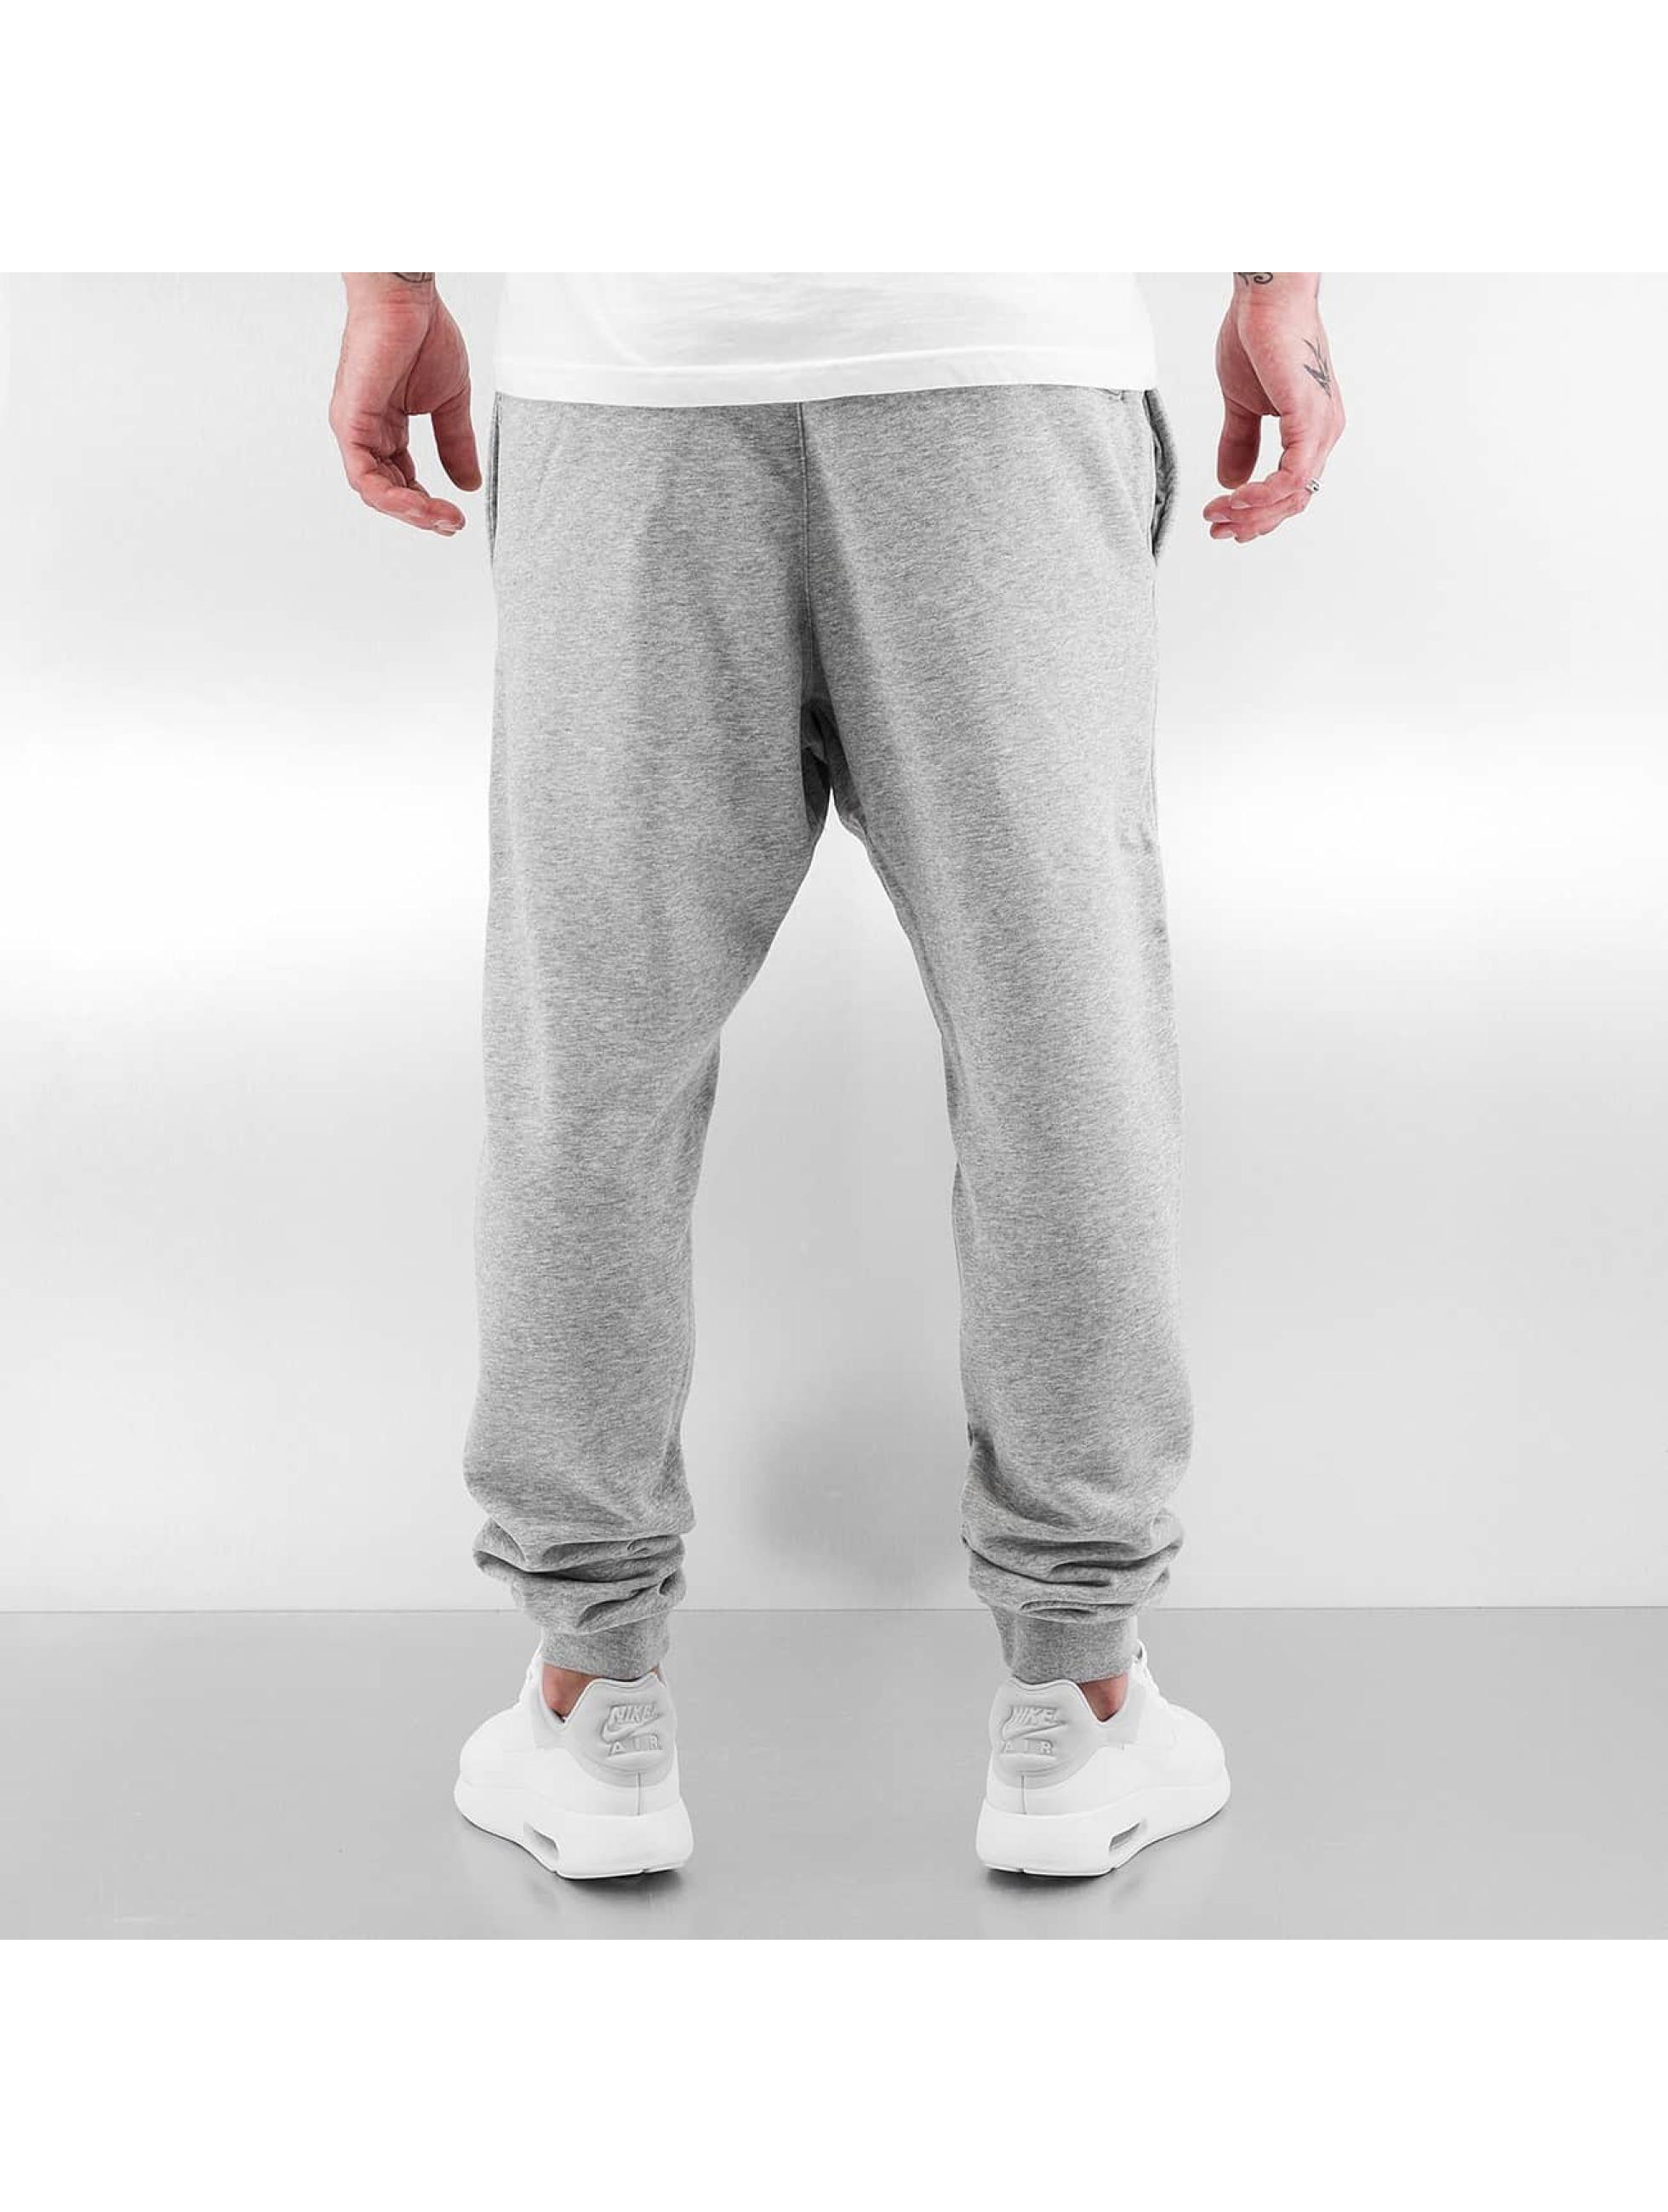 Nike Jogginghose Sportswear grau